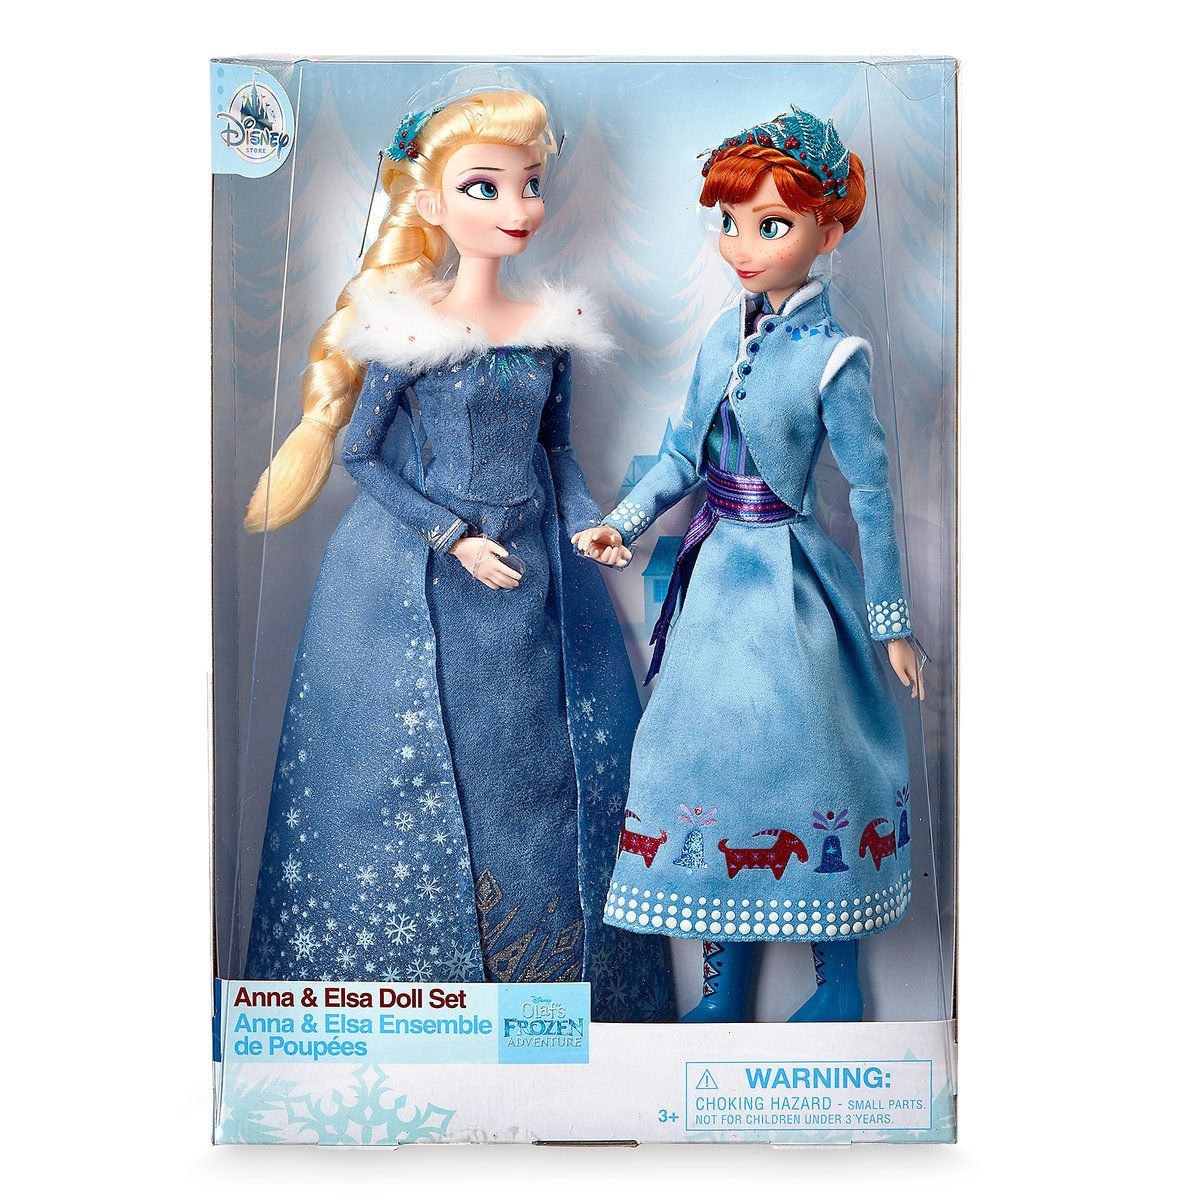 Anna And Elsa Classic Doll Set Olaf S Frozen Adventure 11 1 2 Elsa And Anna Dolls Disney Barbie Dolls Disney Princess Dolls